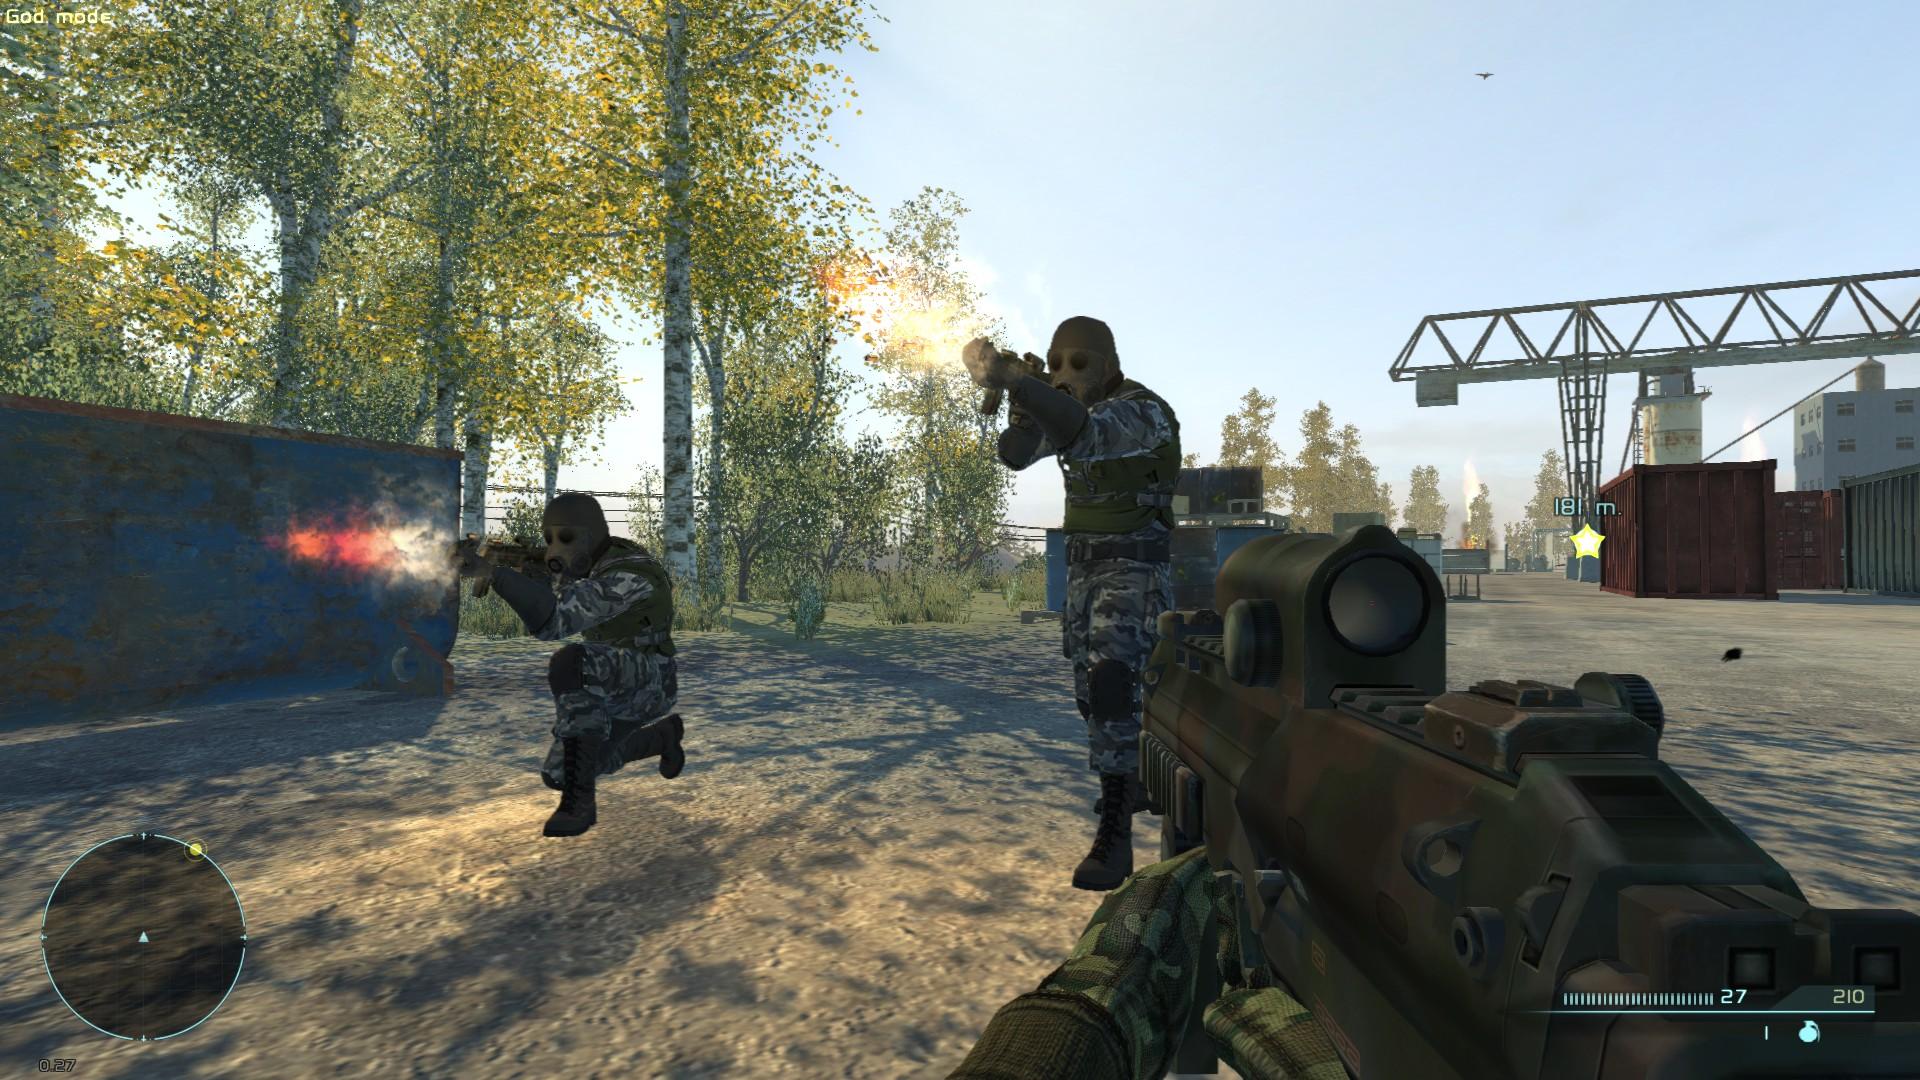 Шутеры Manhunter и Chernobyl Commando удалены из Steam